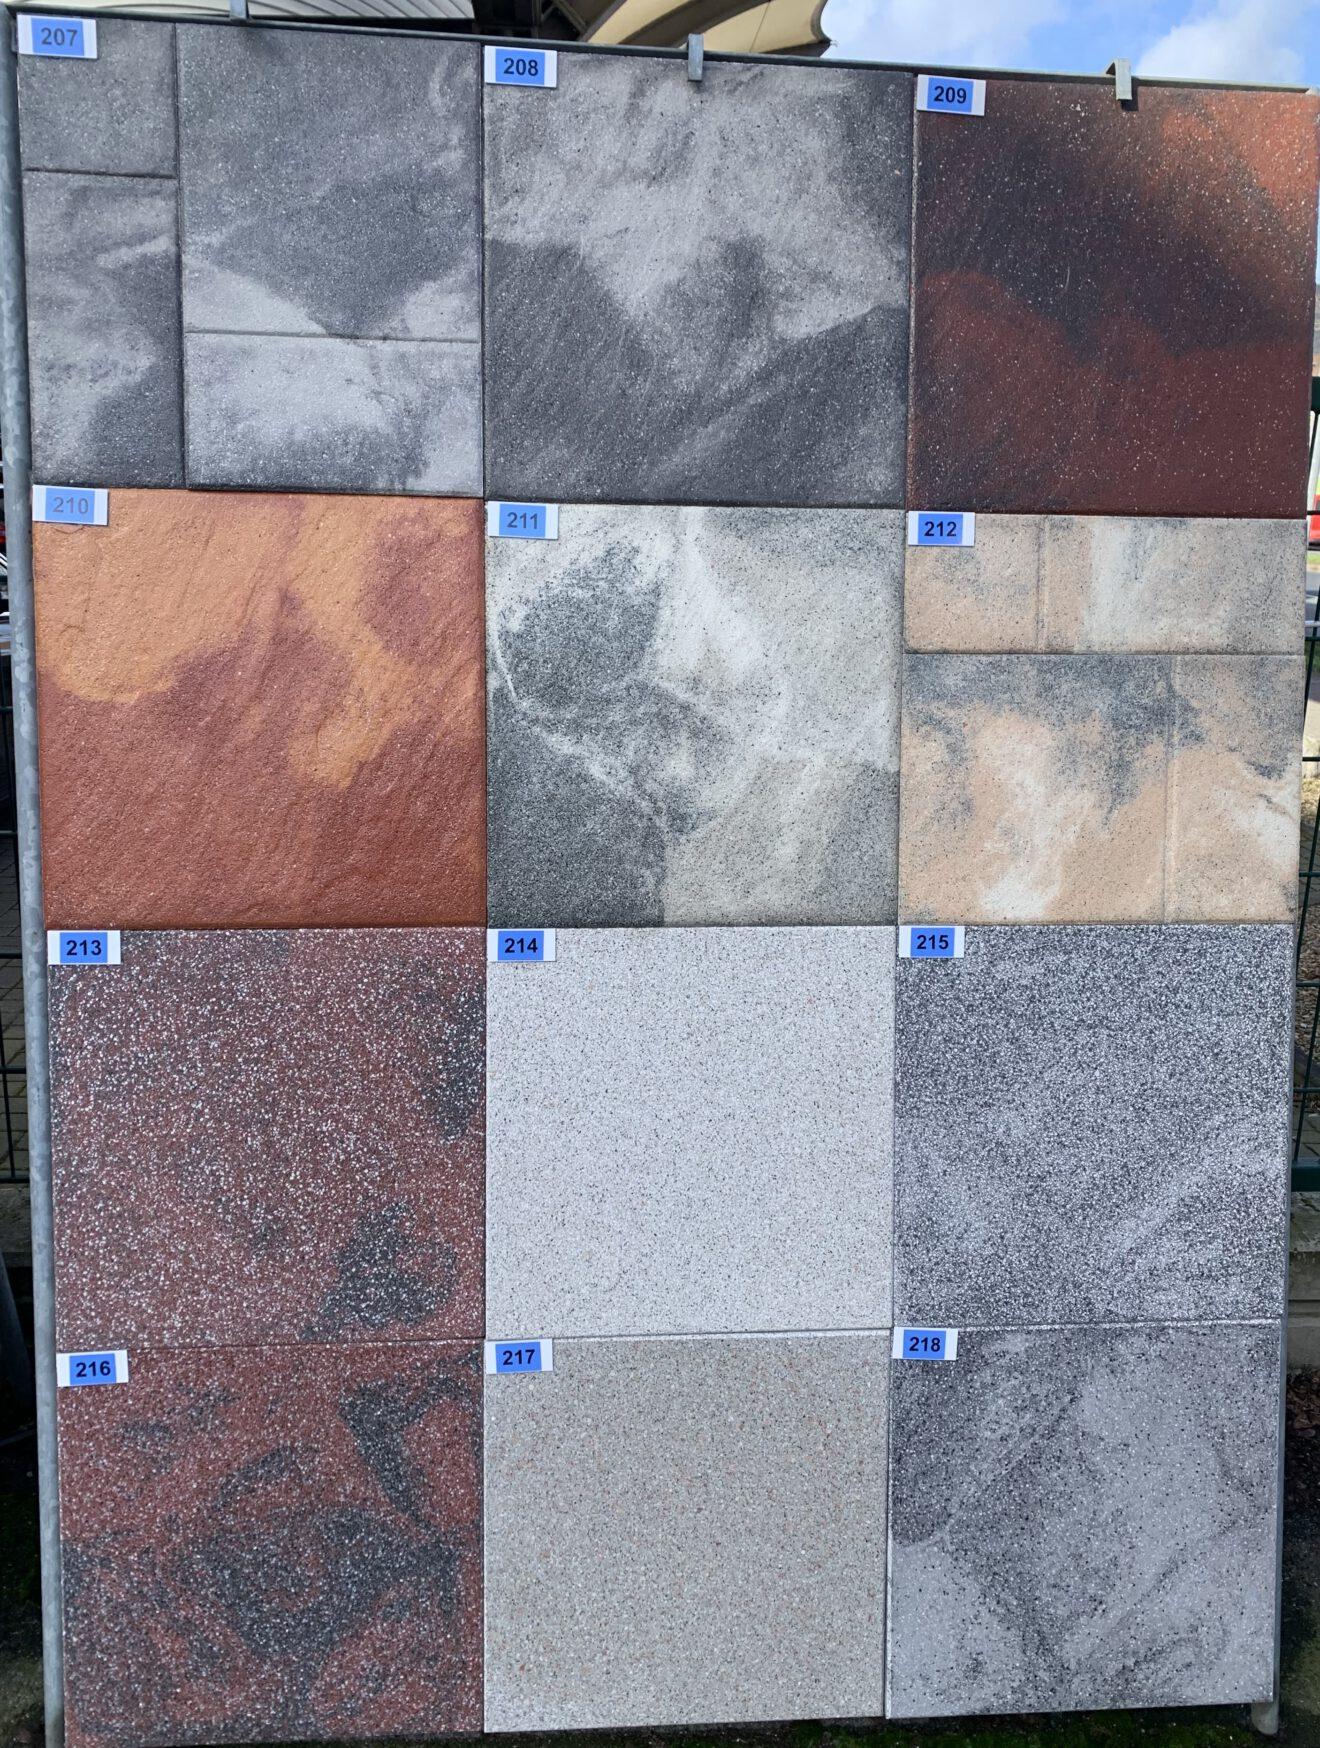 Terrassenplatte Navaclean Rustikano 1 bei Stolzenbach Baustoffe in Bremen kaufen